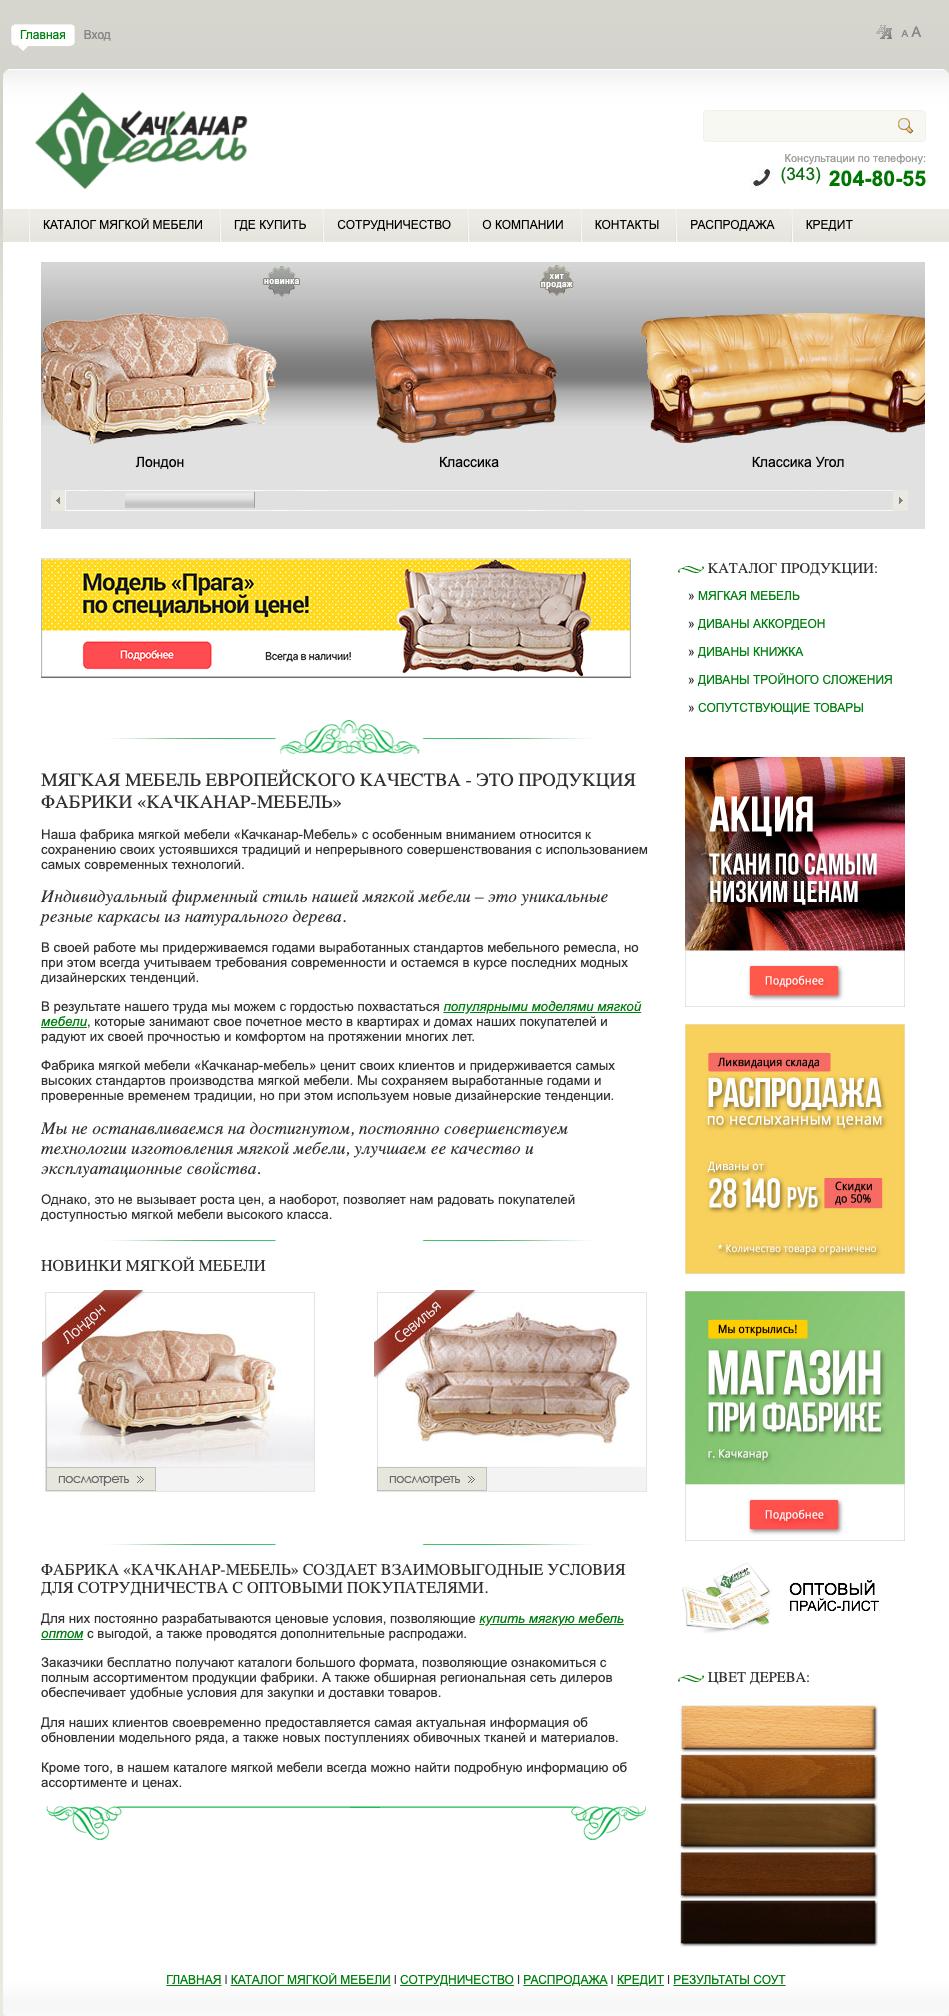 FireShot Capture 088 - «Качканар-Мебель» - фабрика мягкой мебели - kachmebel.ru